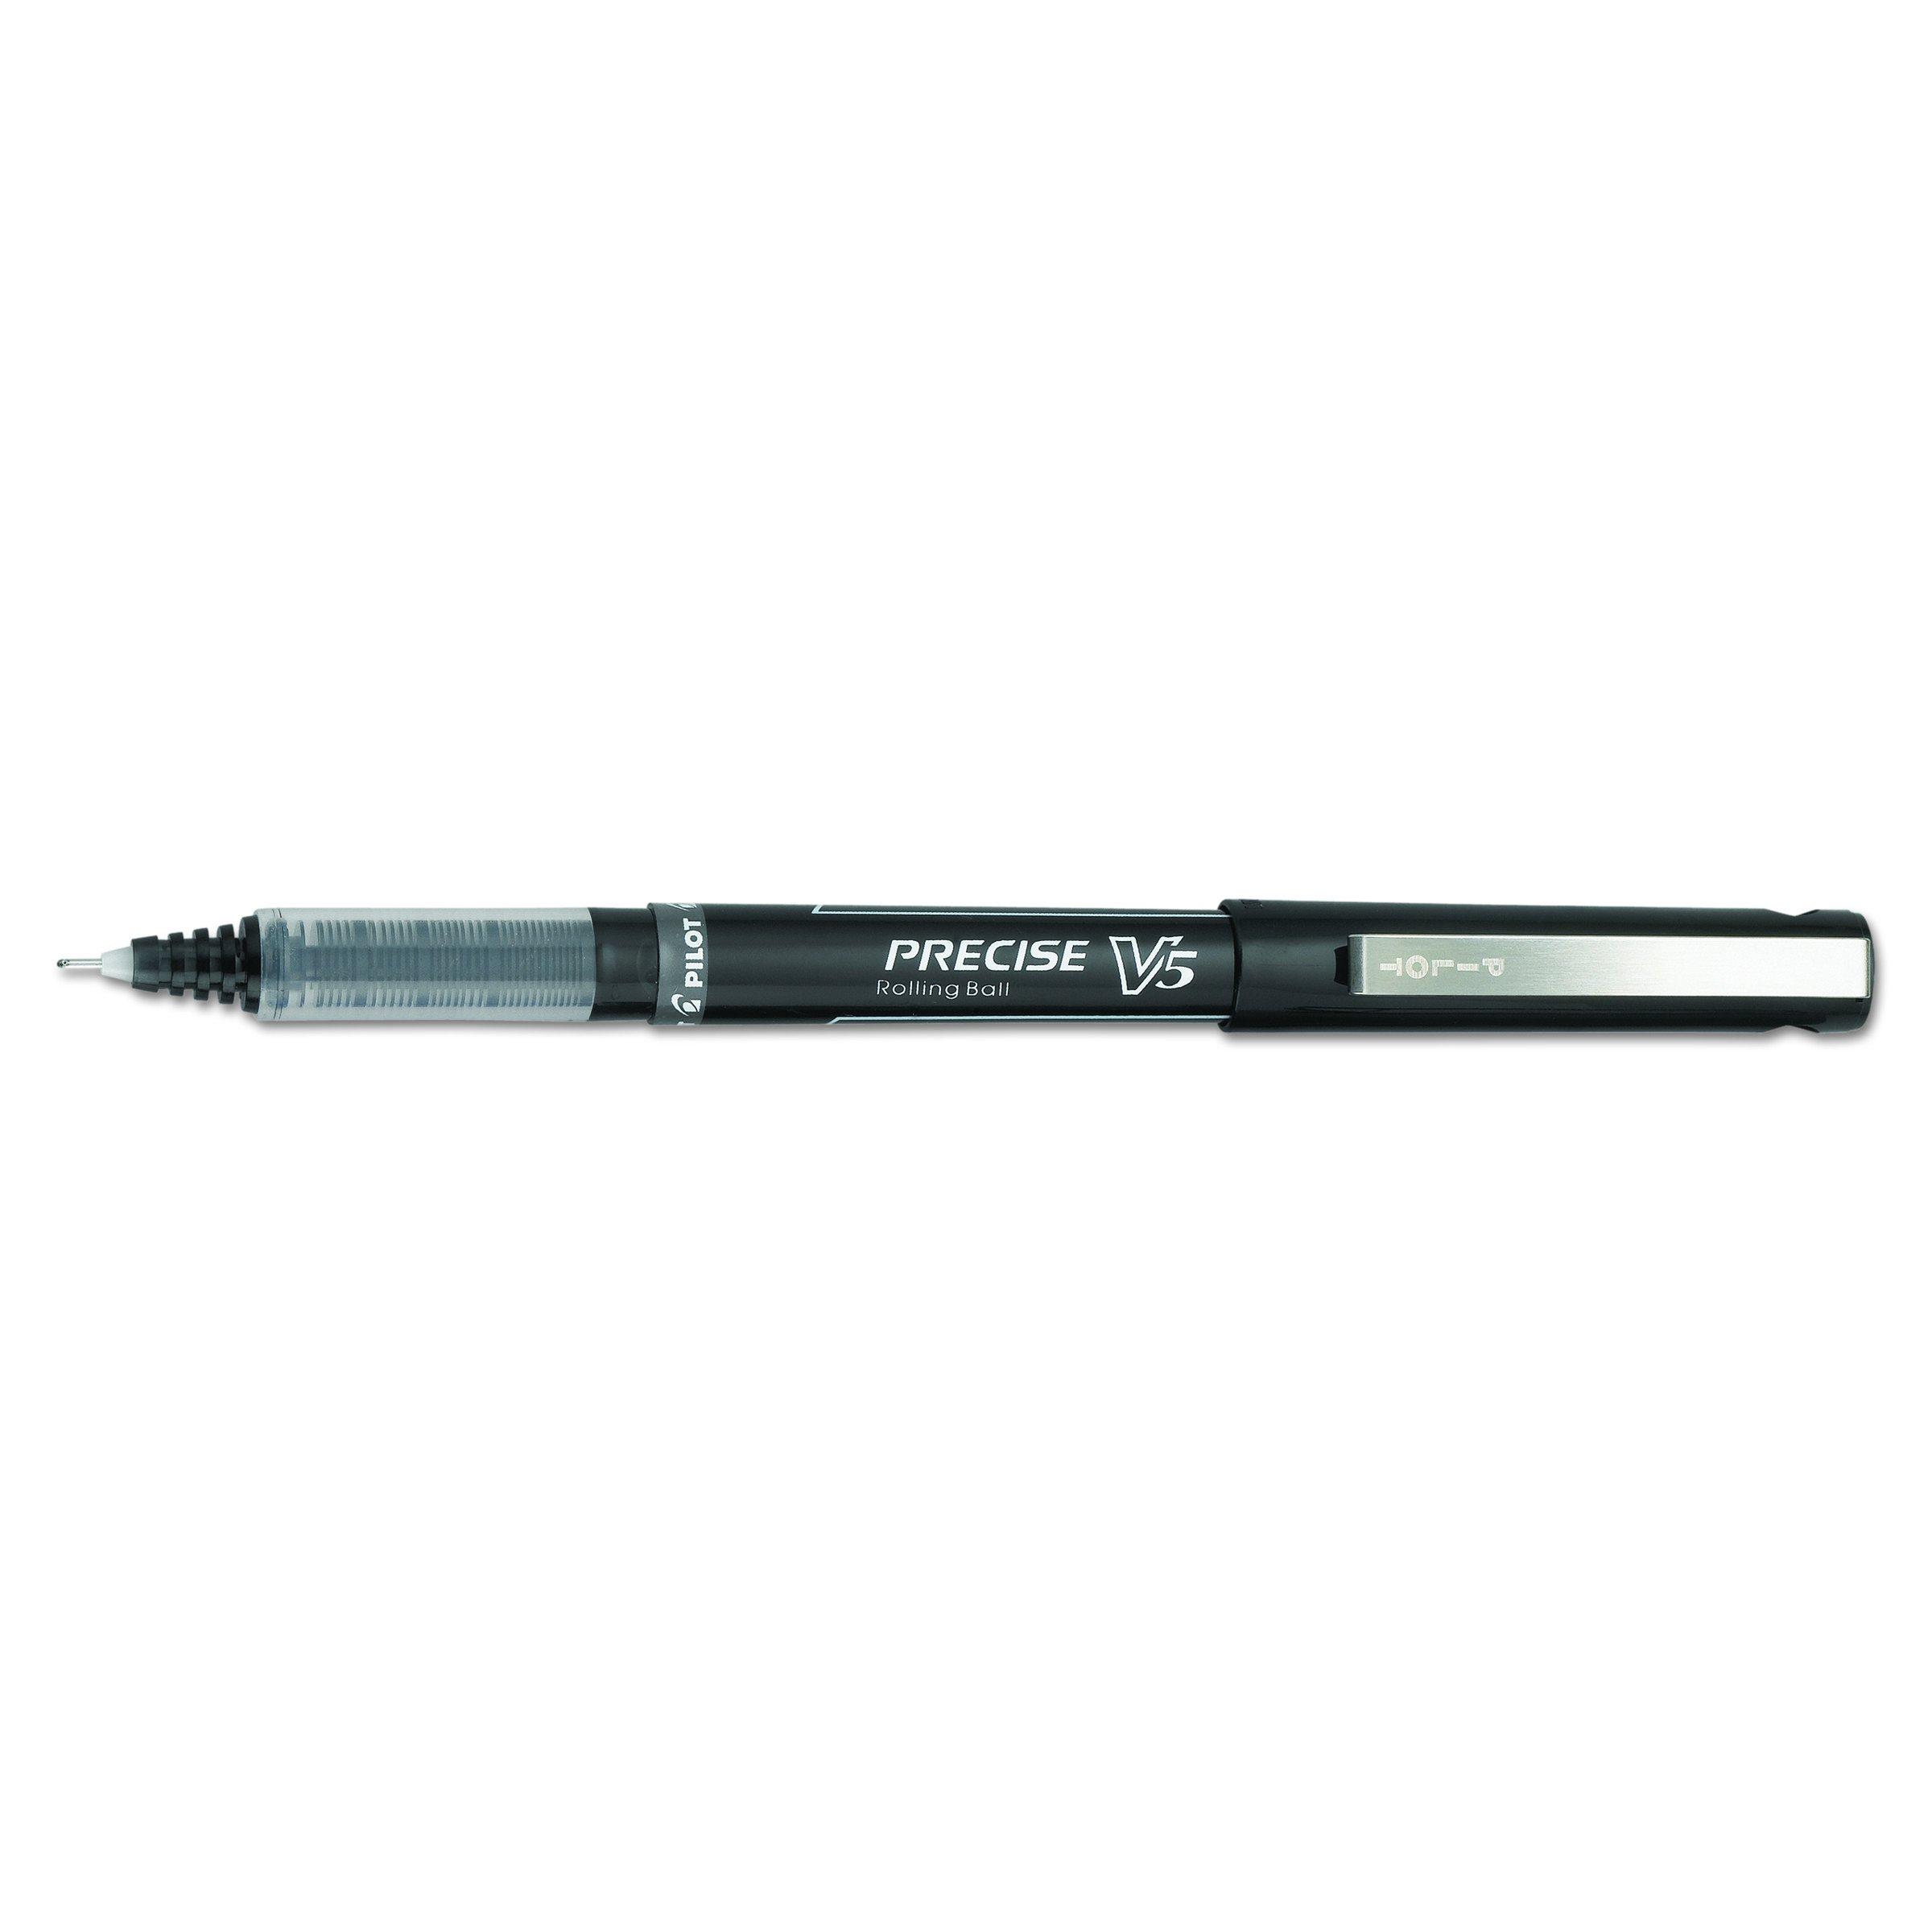 Pilot Precise V5 Roller Ball Stick Pen, Precision Point, Ink.5mm, Pack of 12, Black (35334) by Pilot